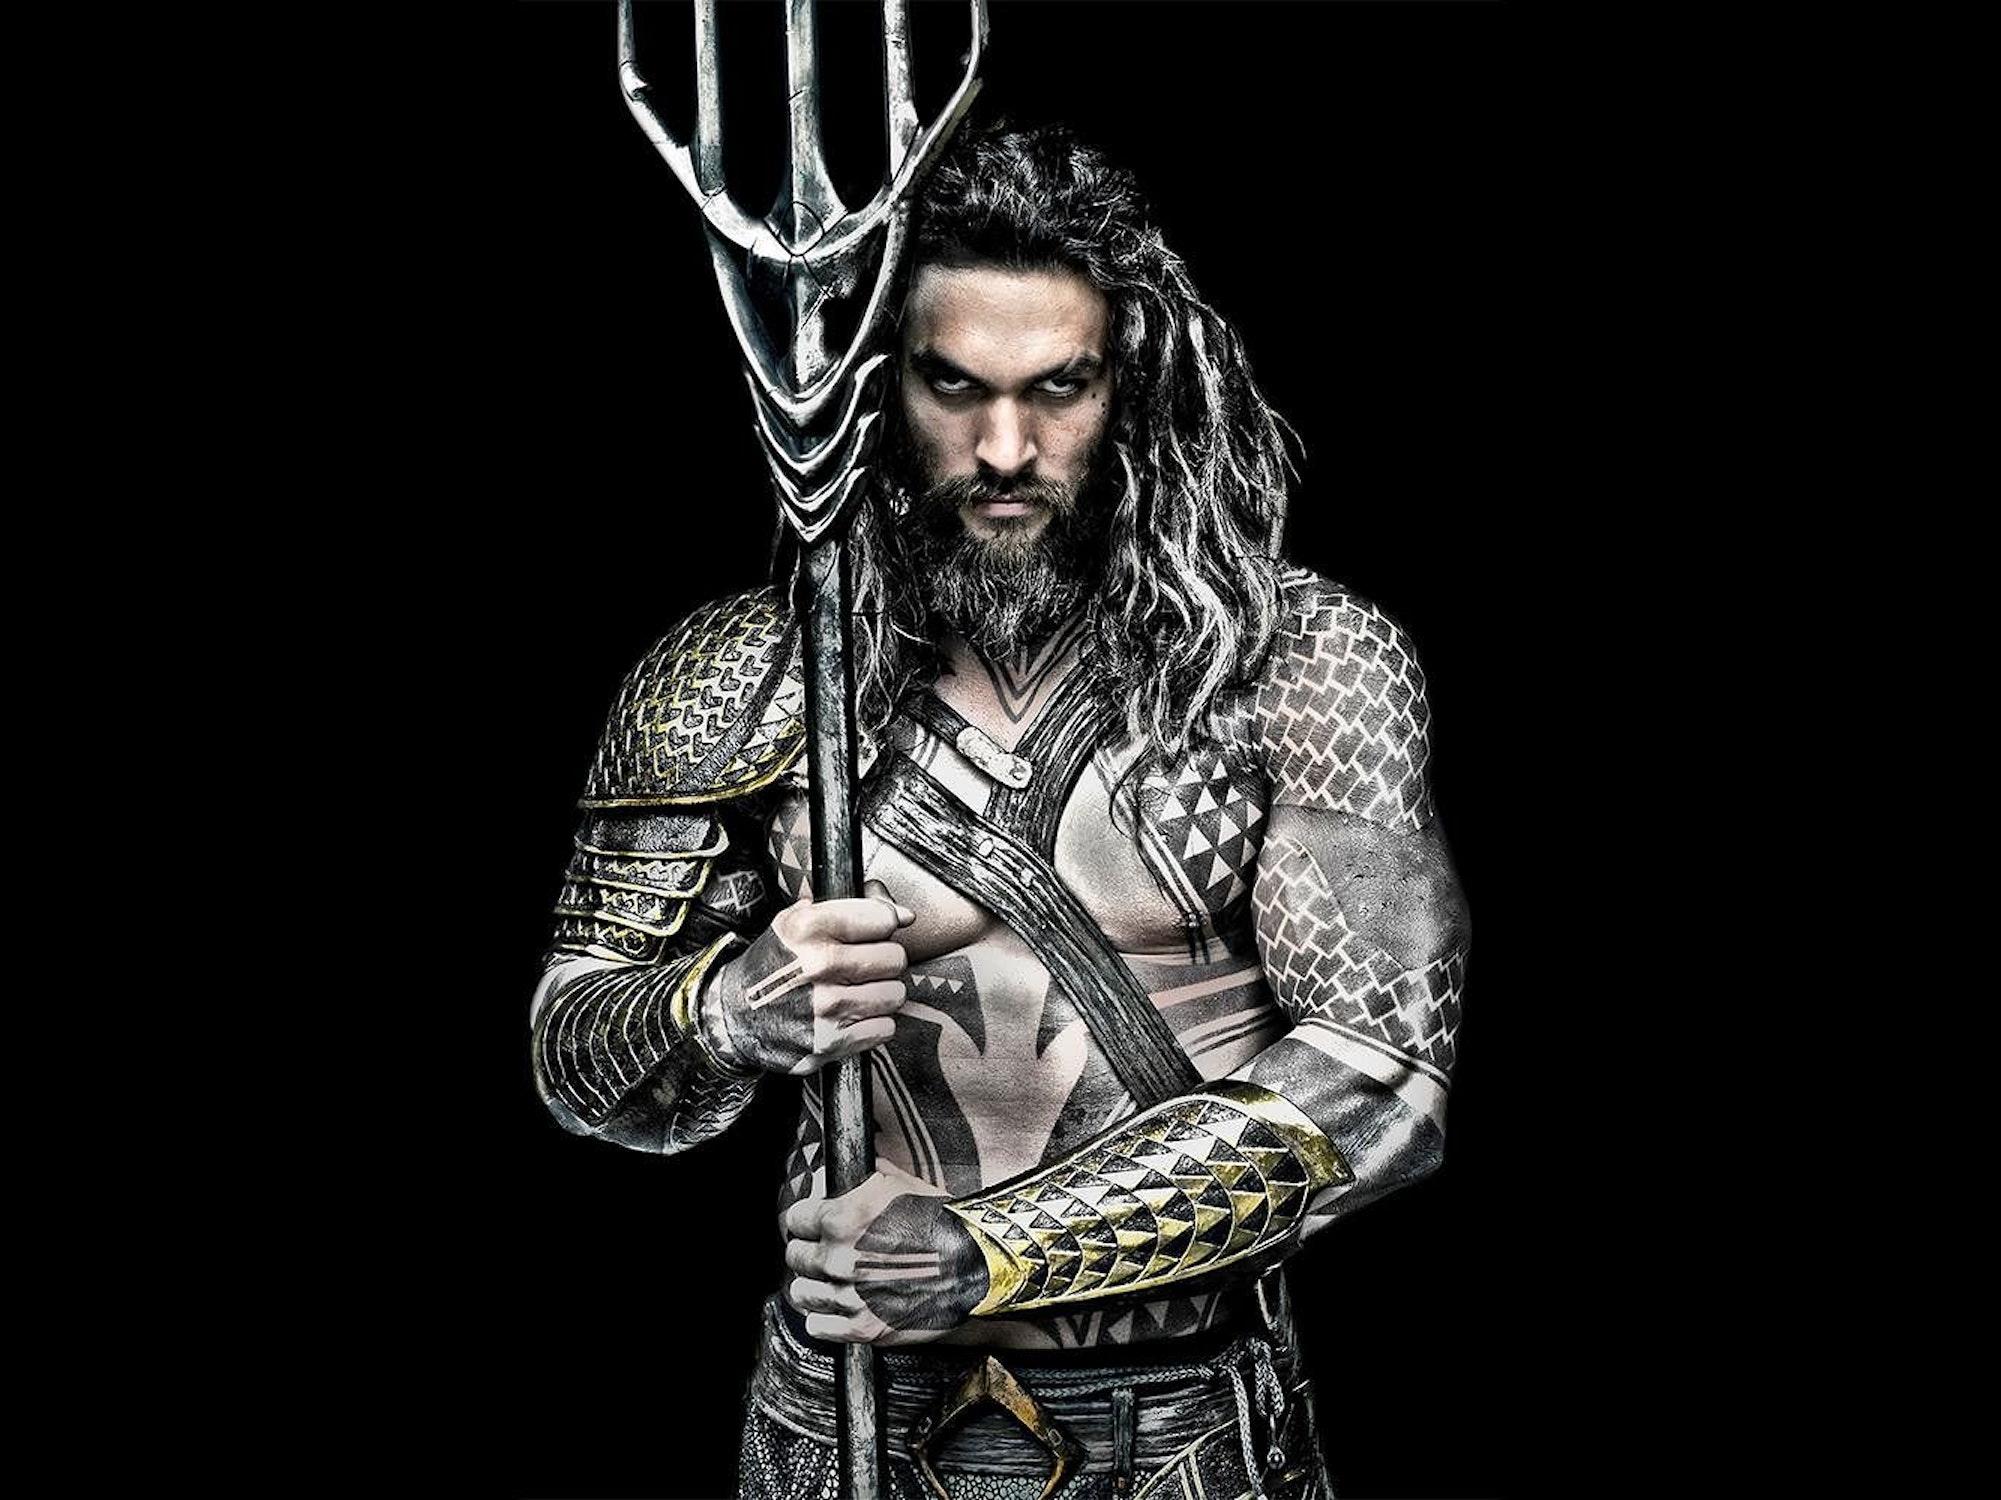 Aquaman' Will Be DC's Darkest Film To Date